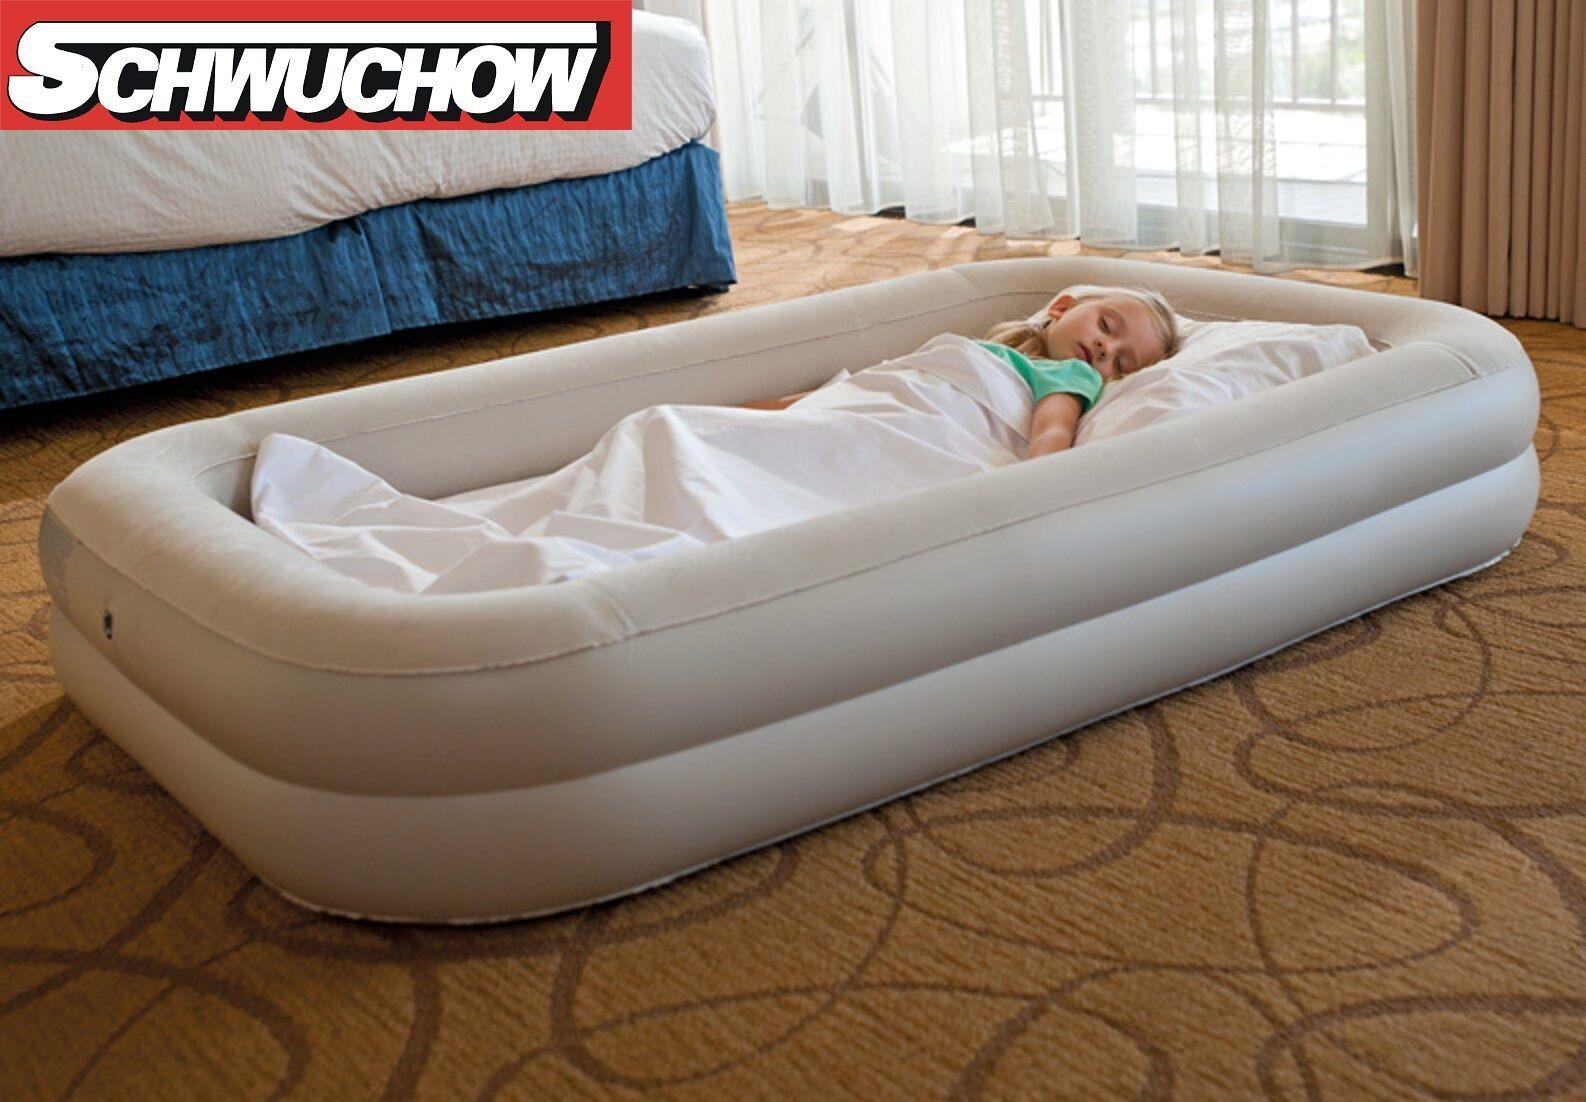 2 x intex Enfants air bed bed bed bed camping bed 107x168x25